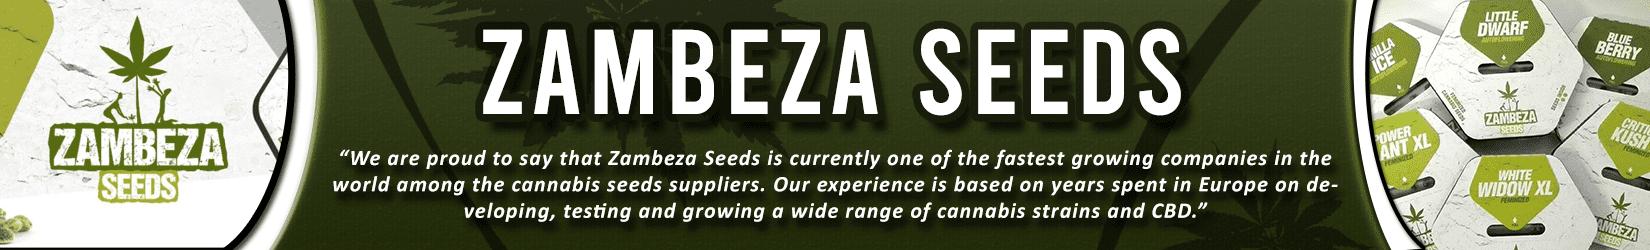 Cannabis Seeds Breeder - Zambeza Seeds